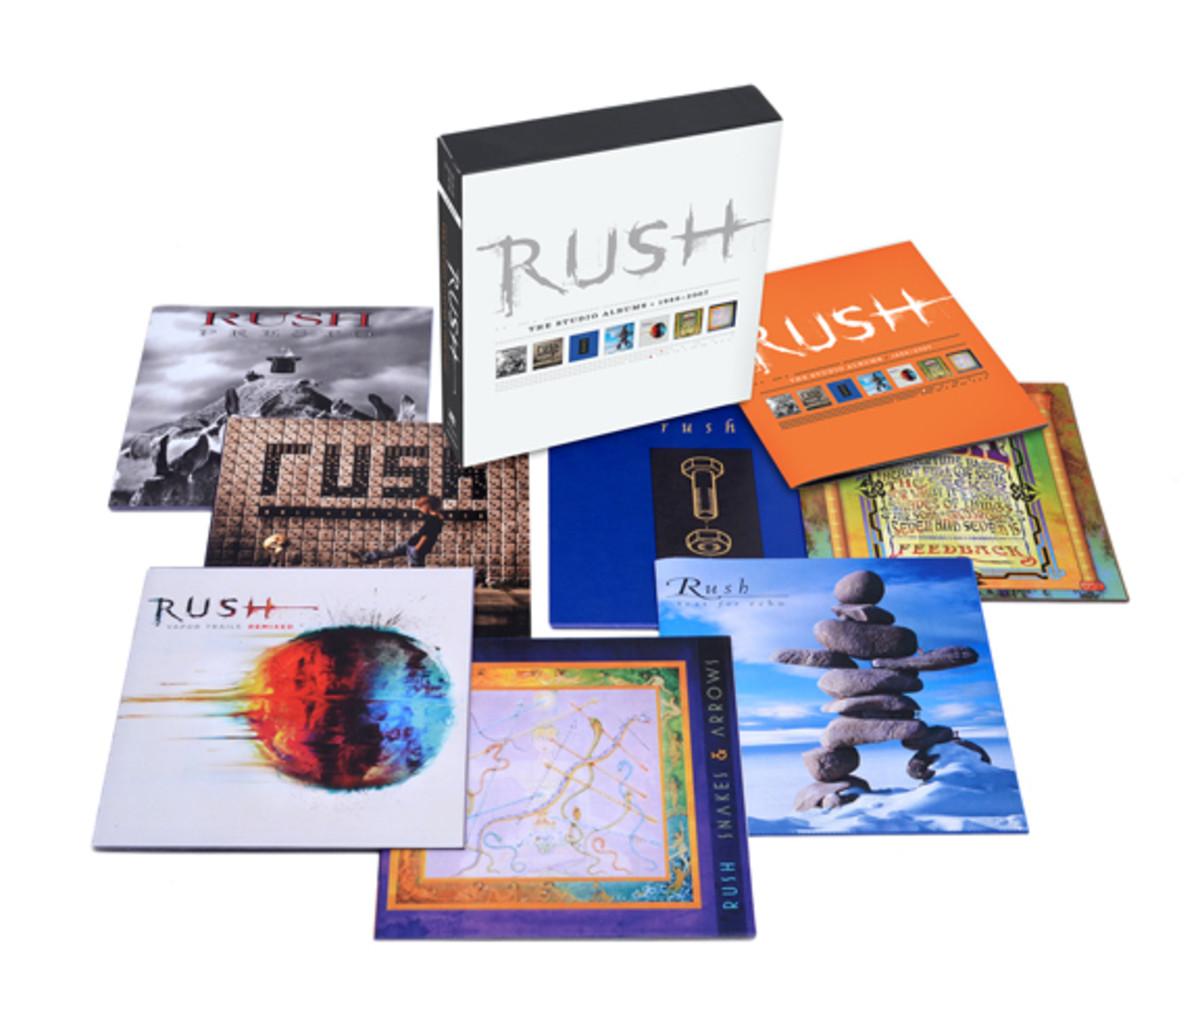 Rush studio albums box set